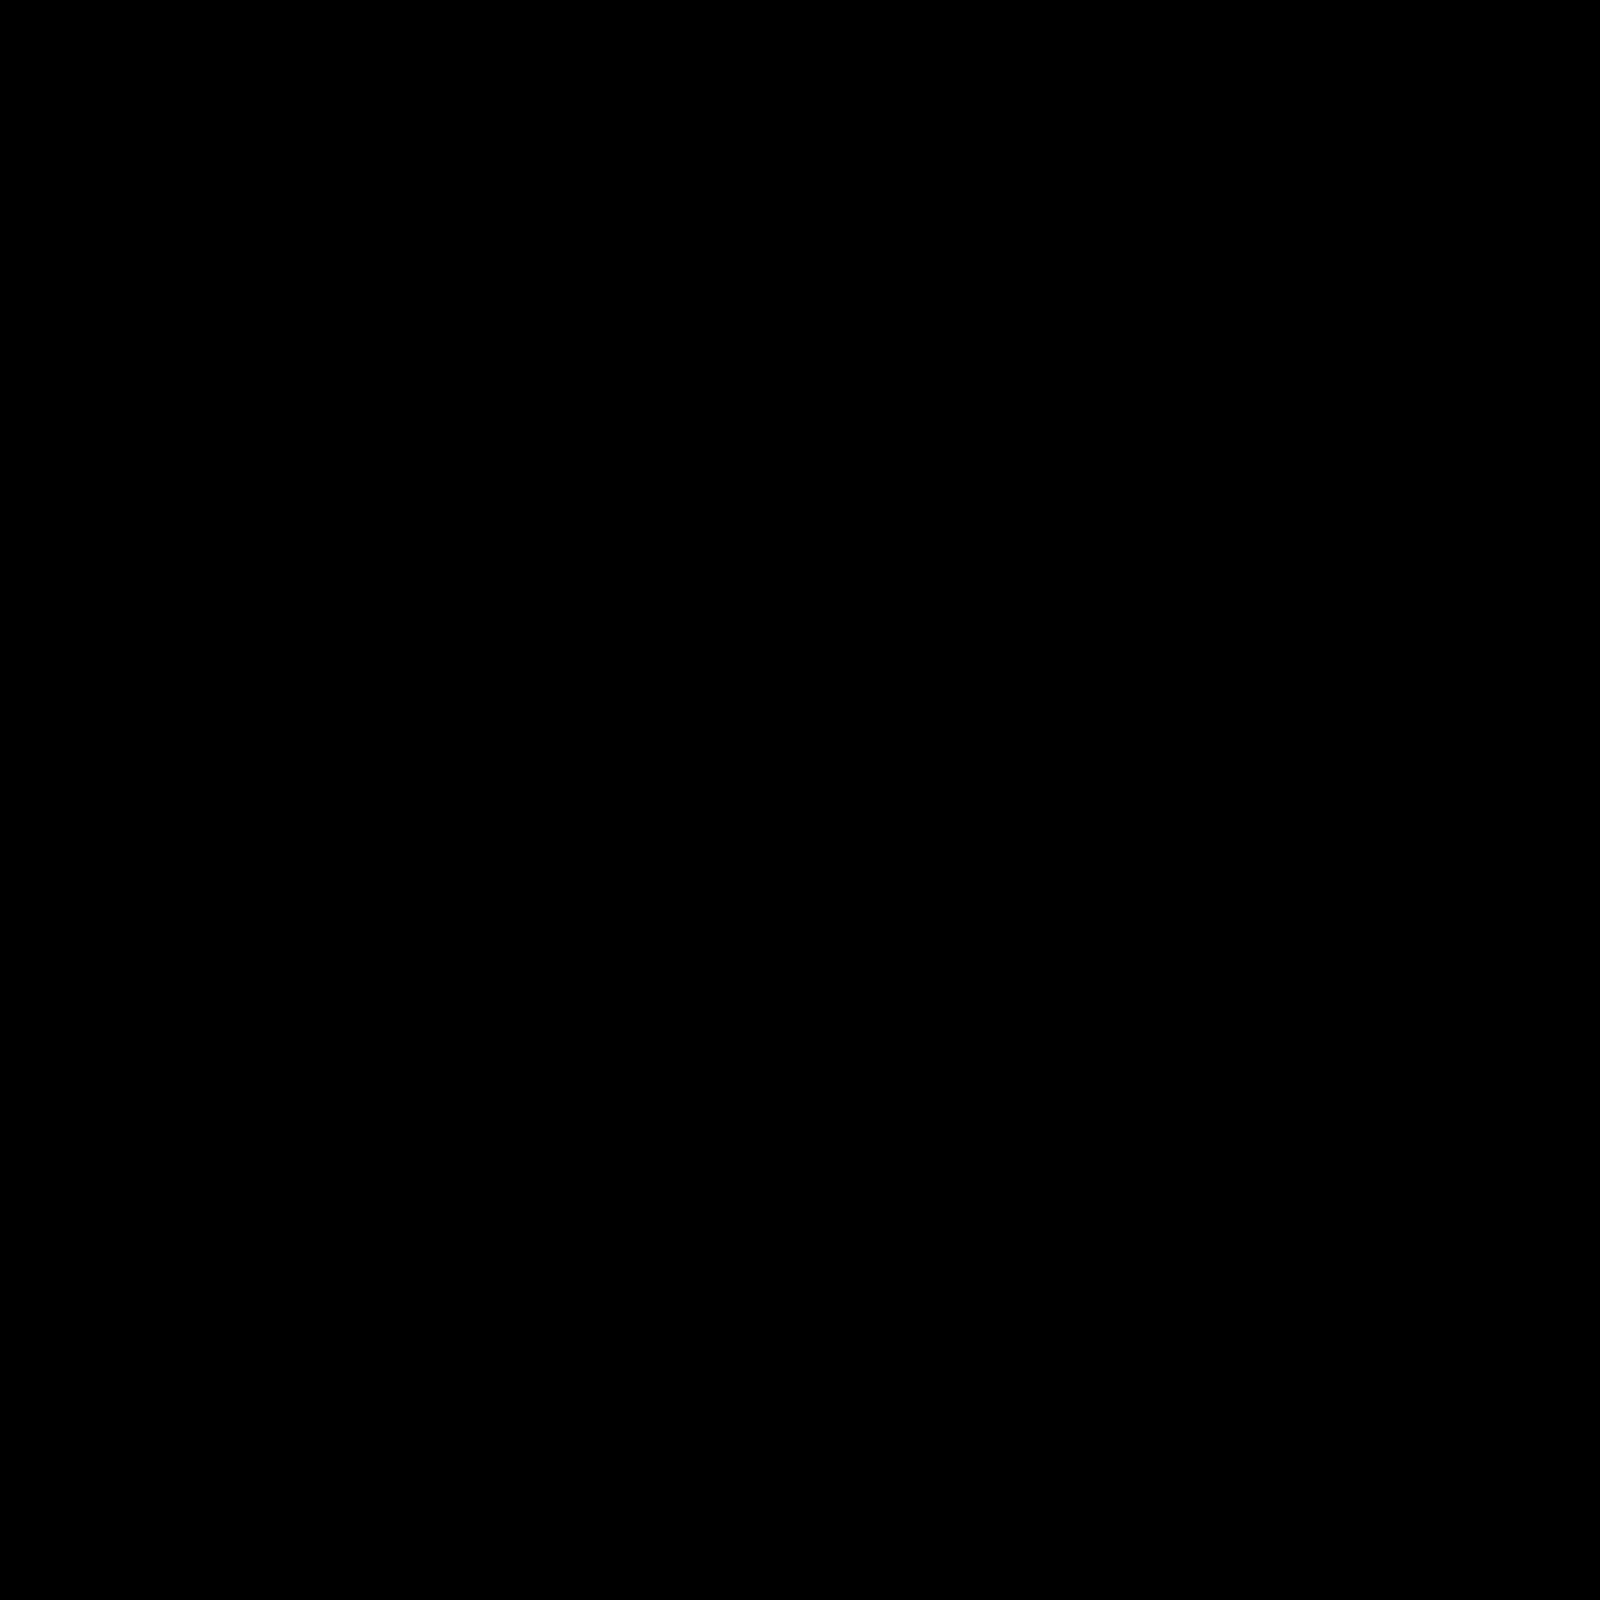 Auto Deskew icon